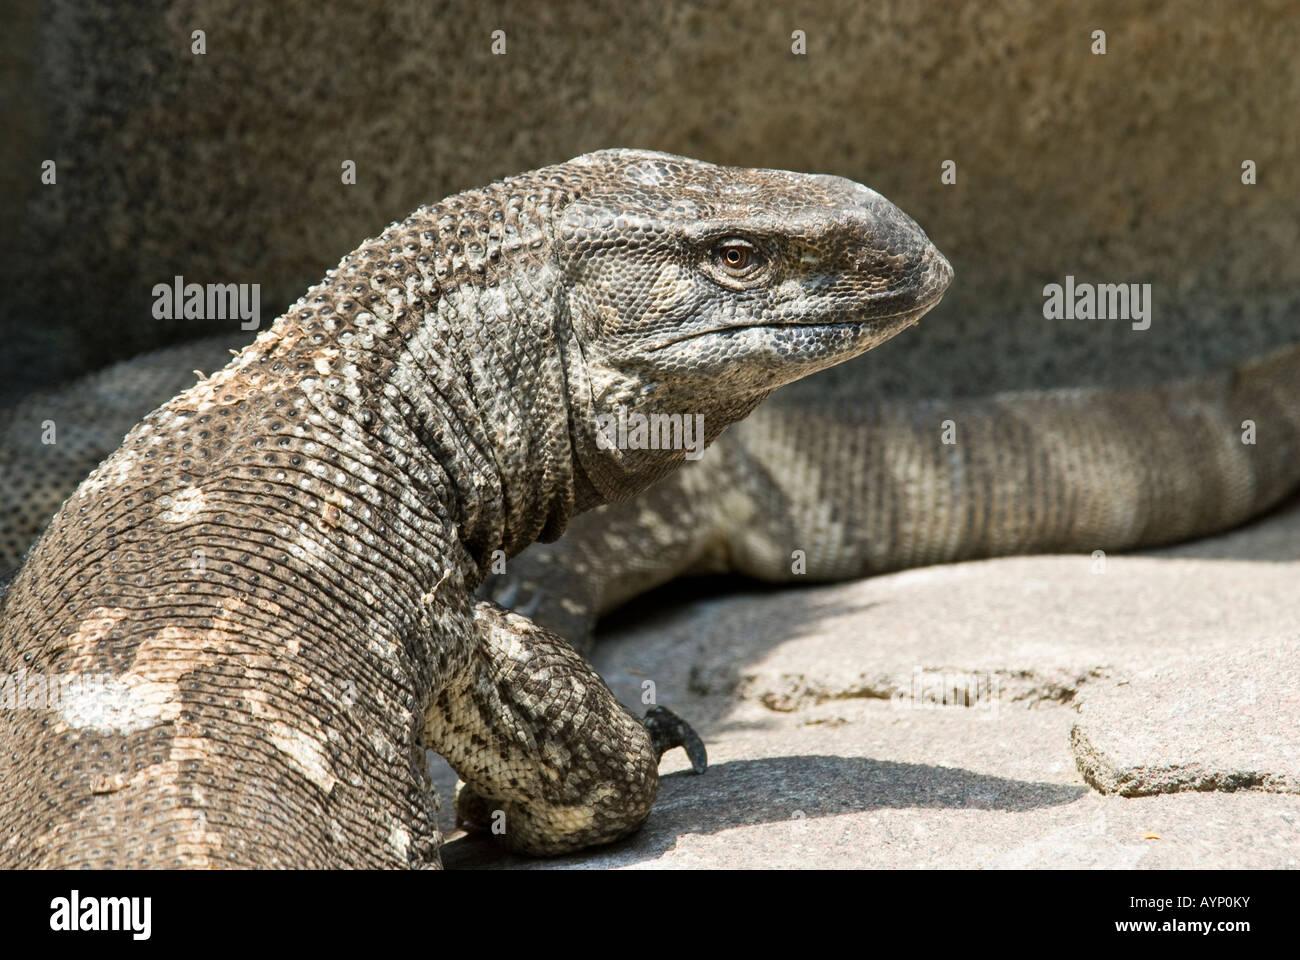 White Throated Monitor Lizard Stock Photo 17154158 Alamy